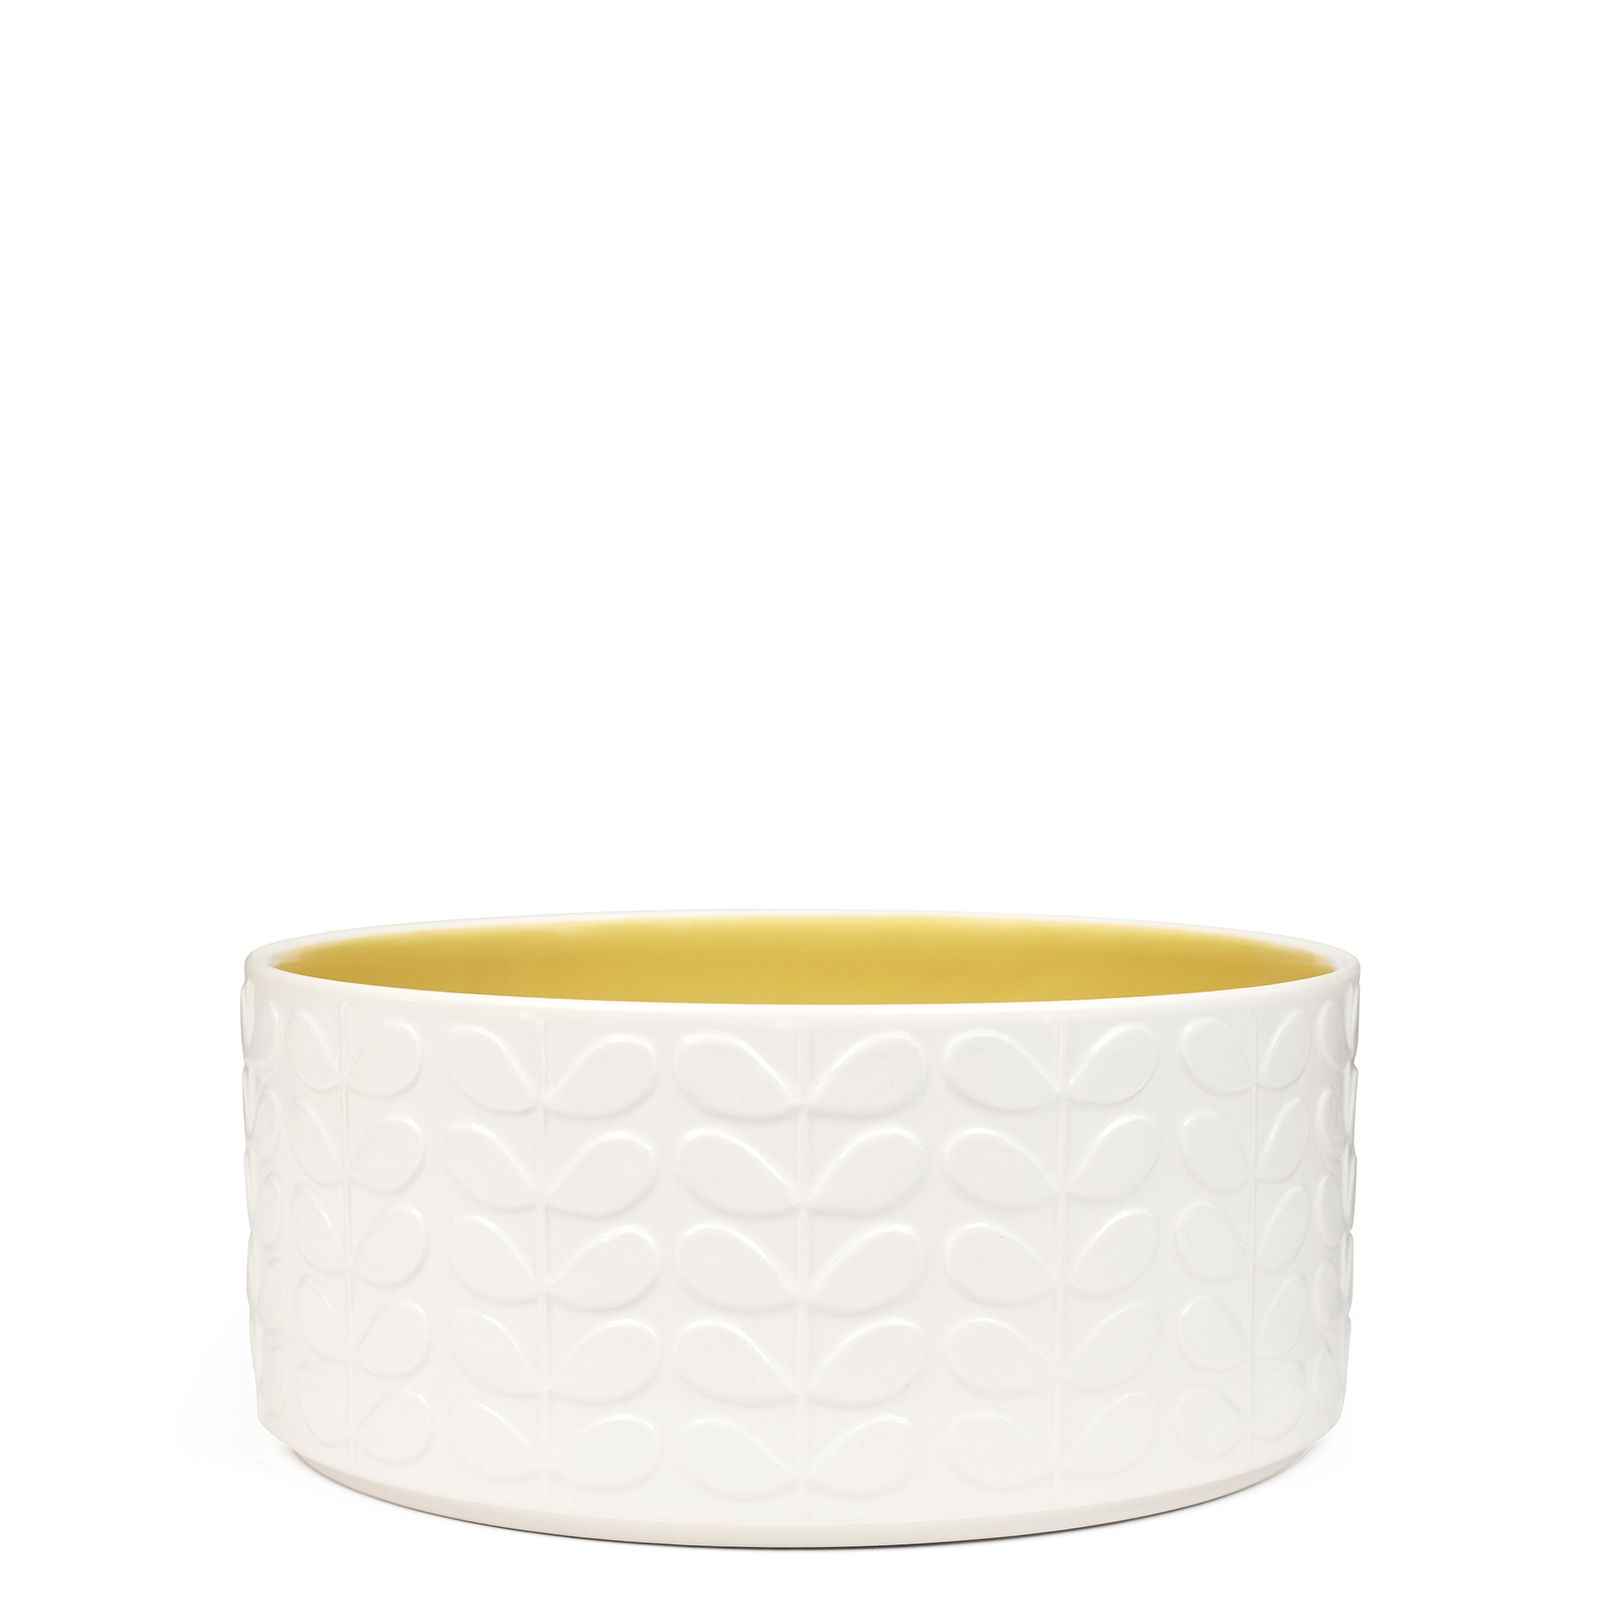 Orla Kiely This Ceramic Salad Bowl With Raised Stem